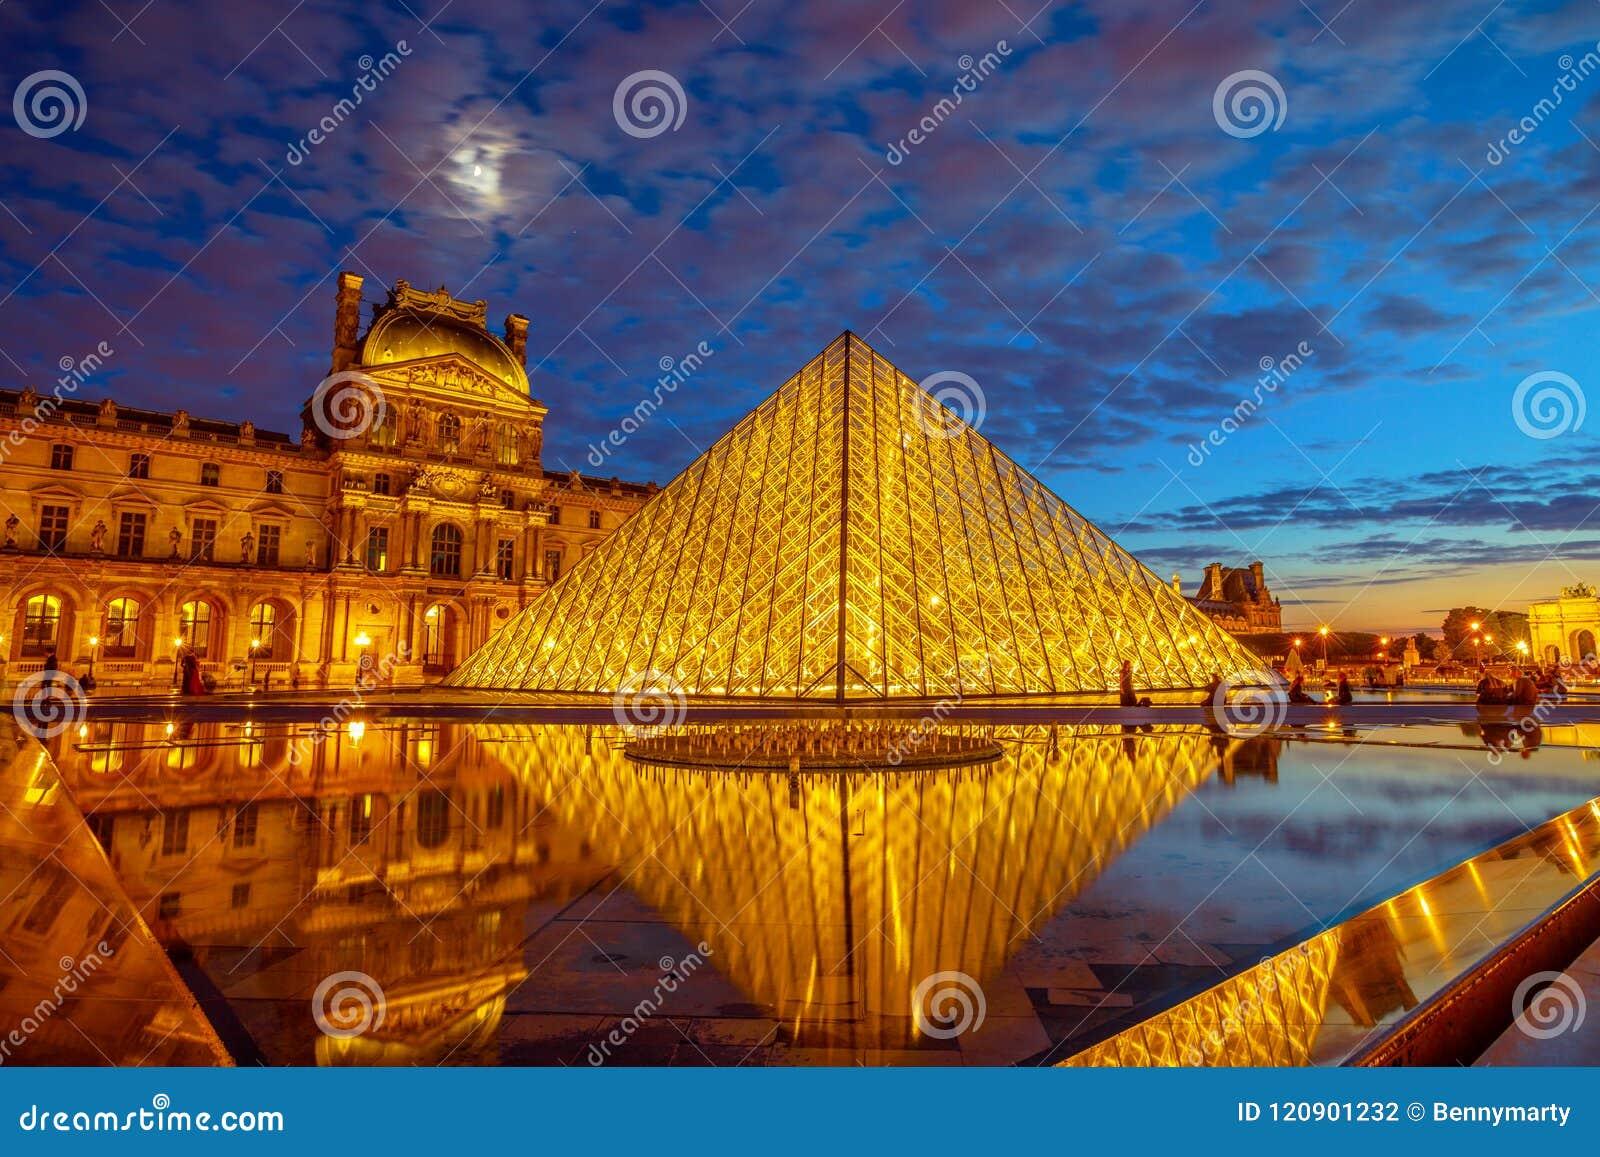 Louvre-Glas-Pyramide